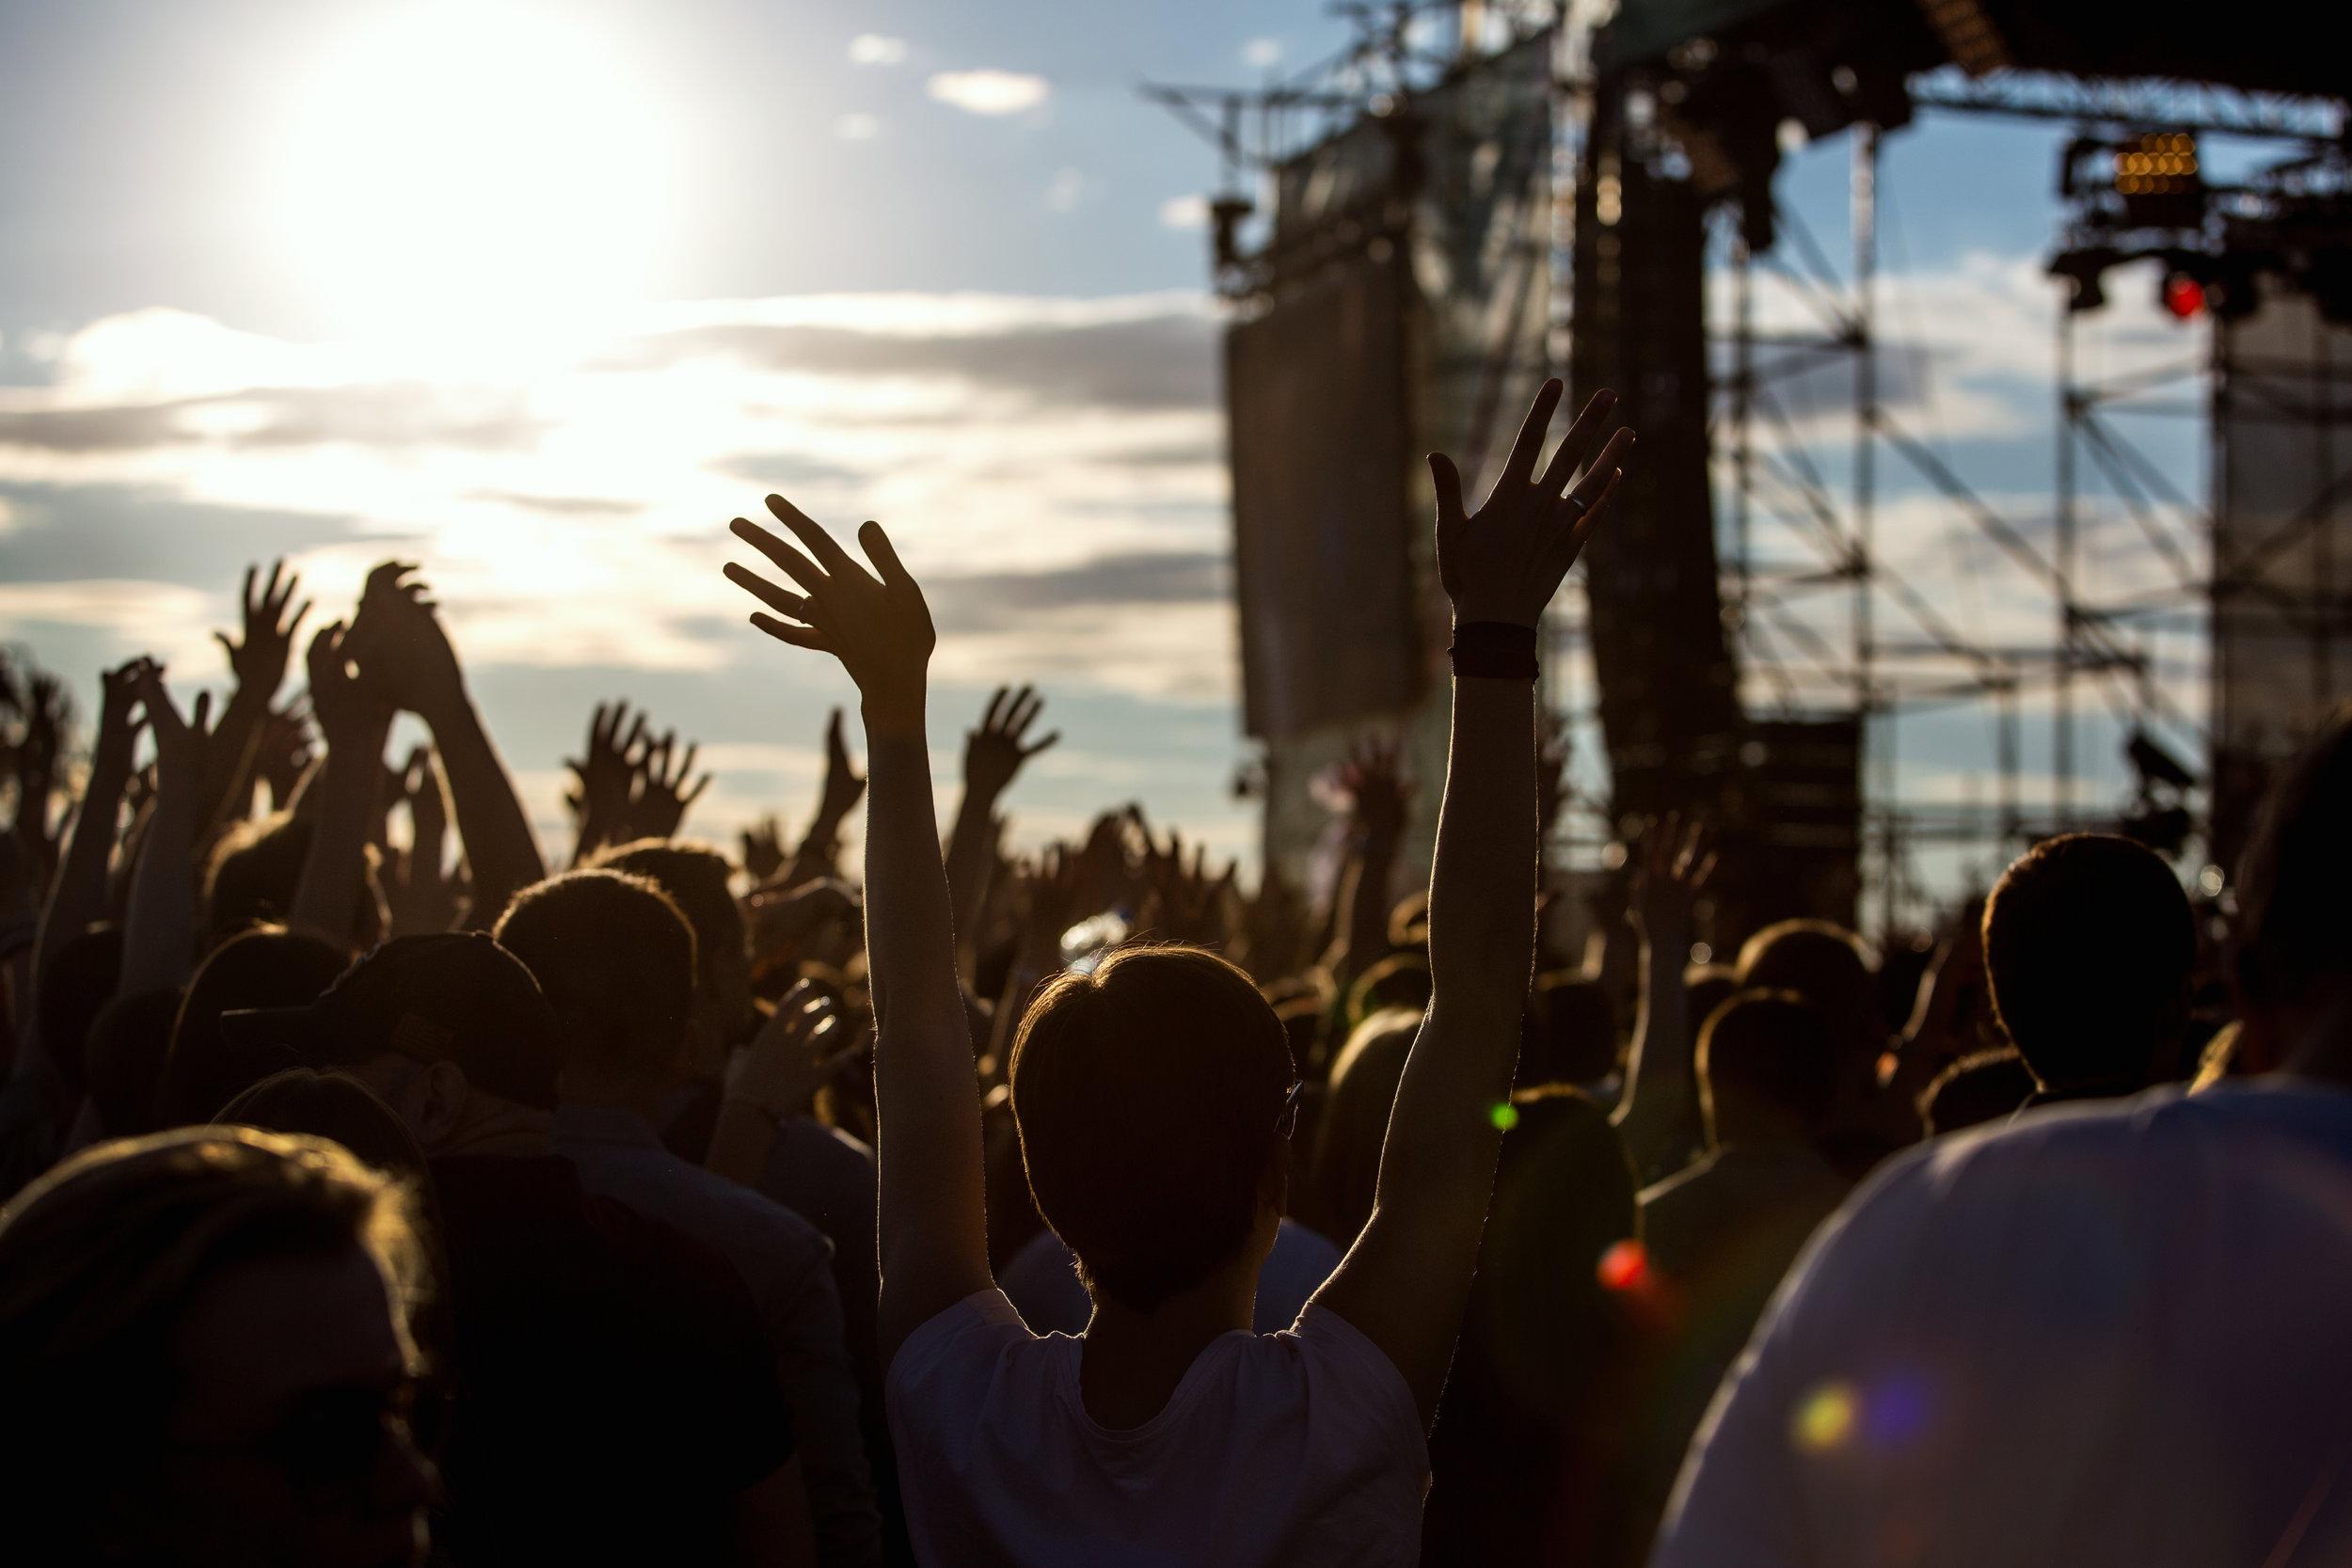 Festival Productions - Let us handle your next Festival experience